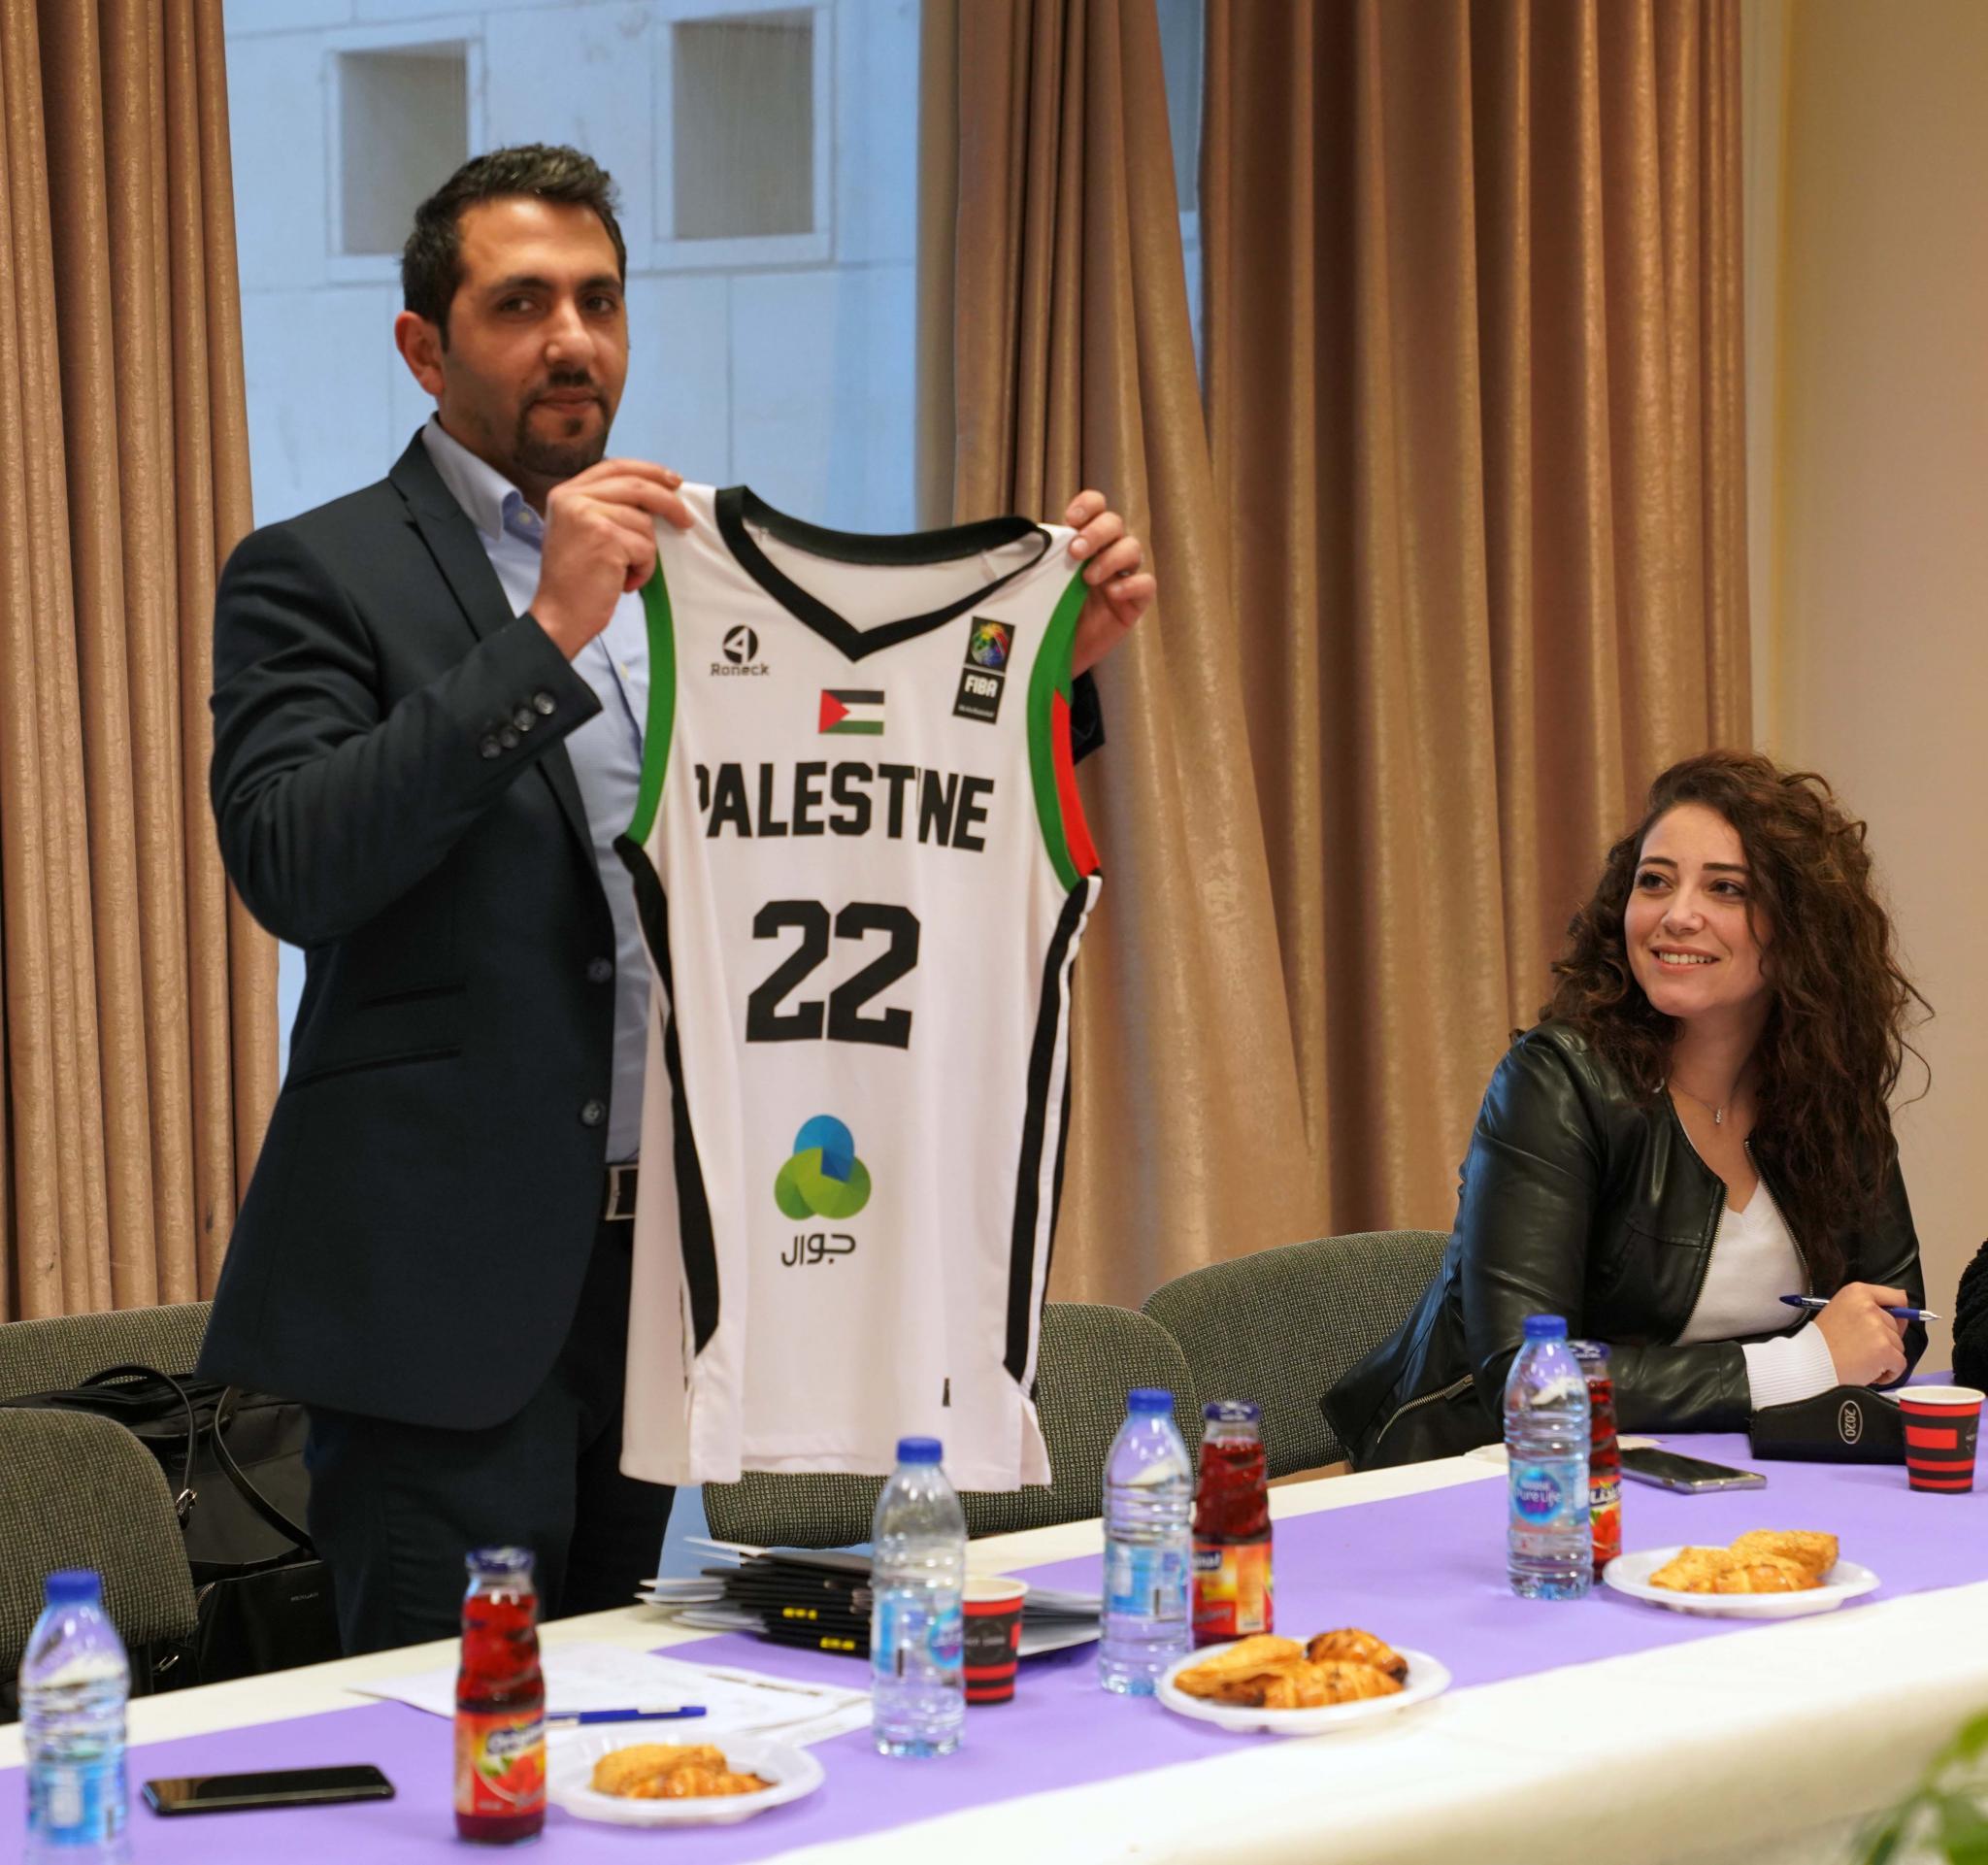 The Palestinian basketball team shirt